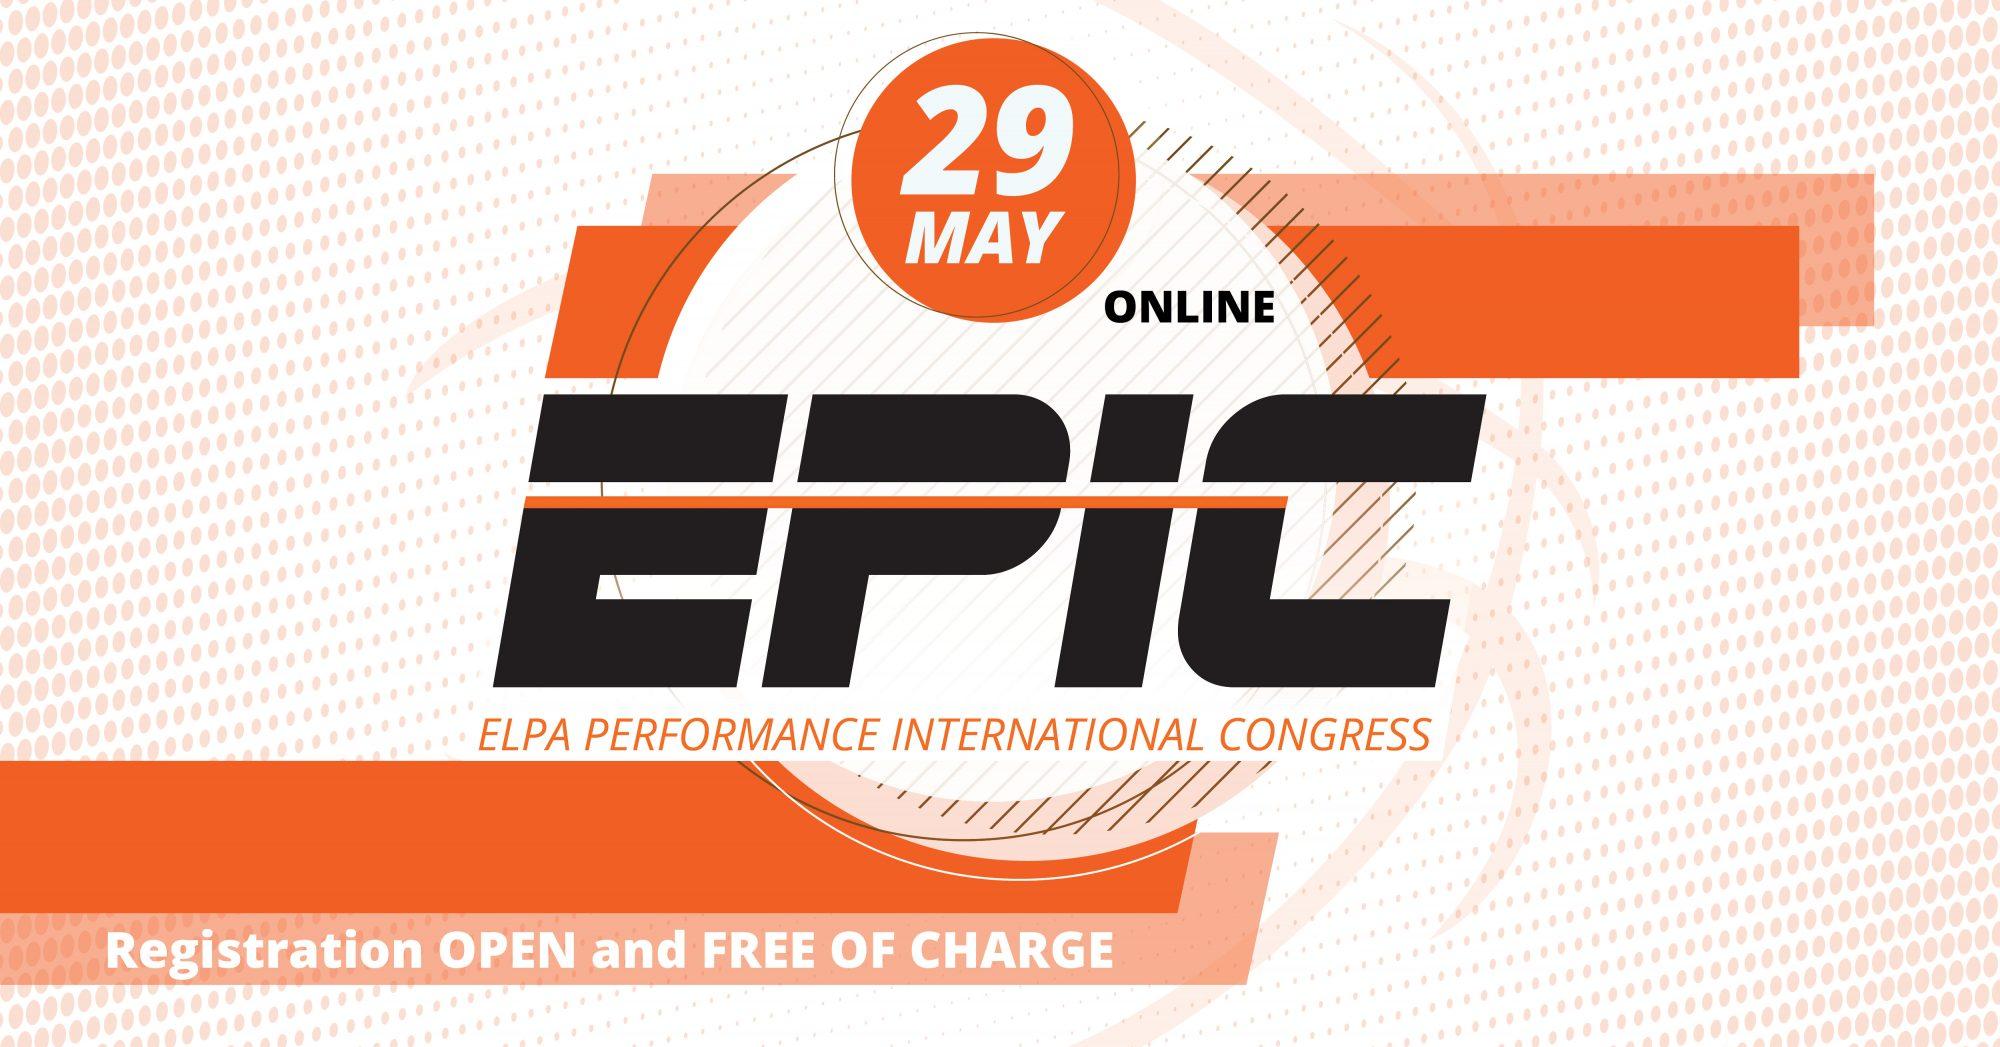 Прв меѓународен конгрес за перформанс од ELPA